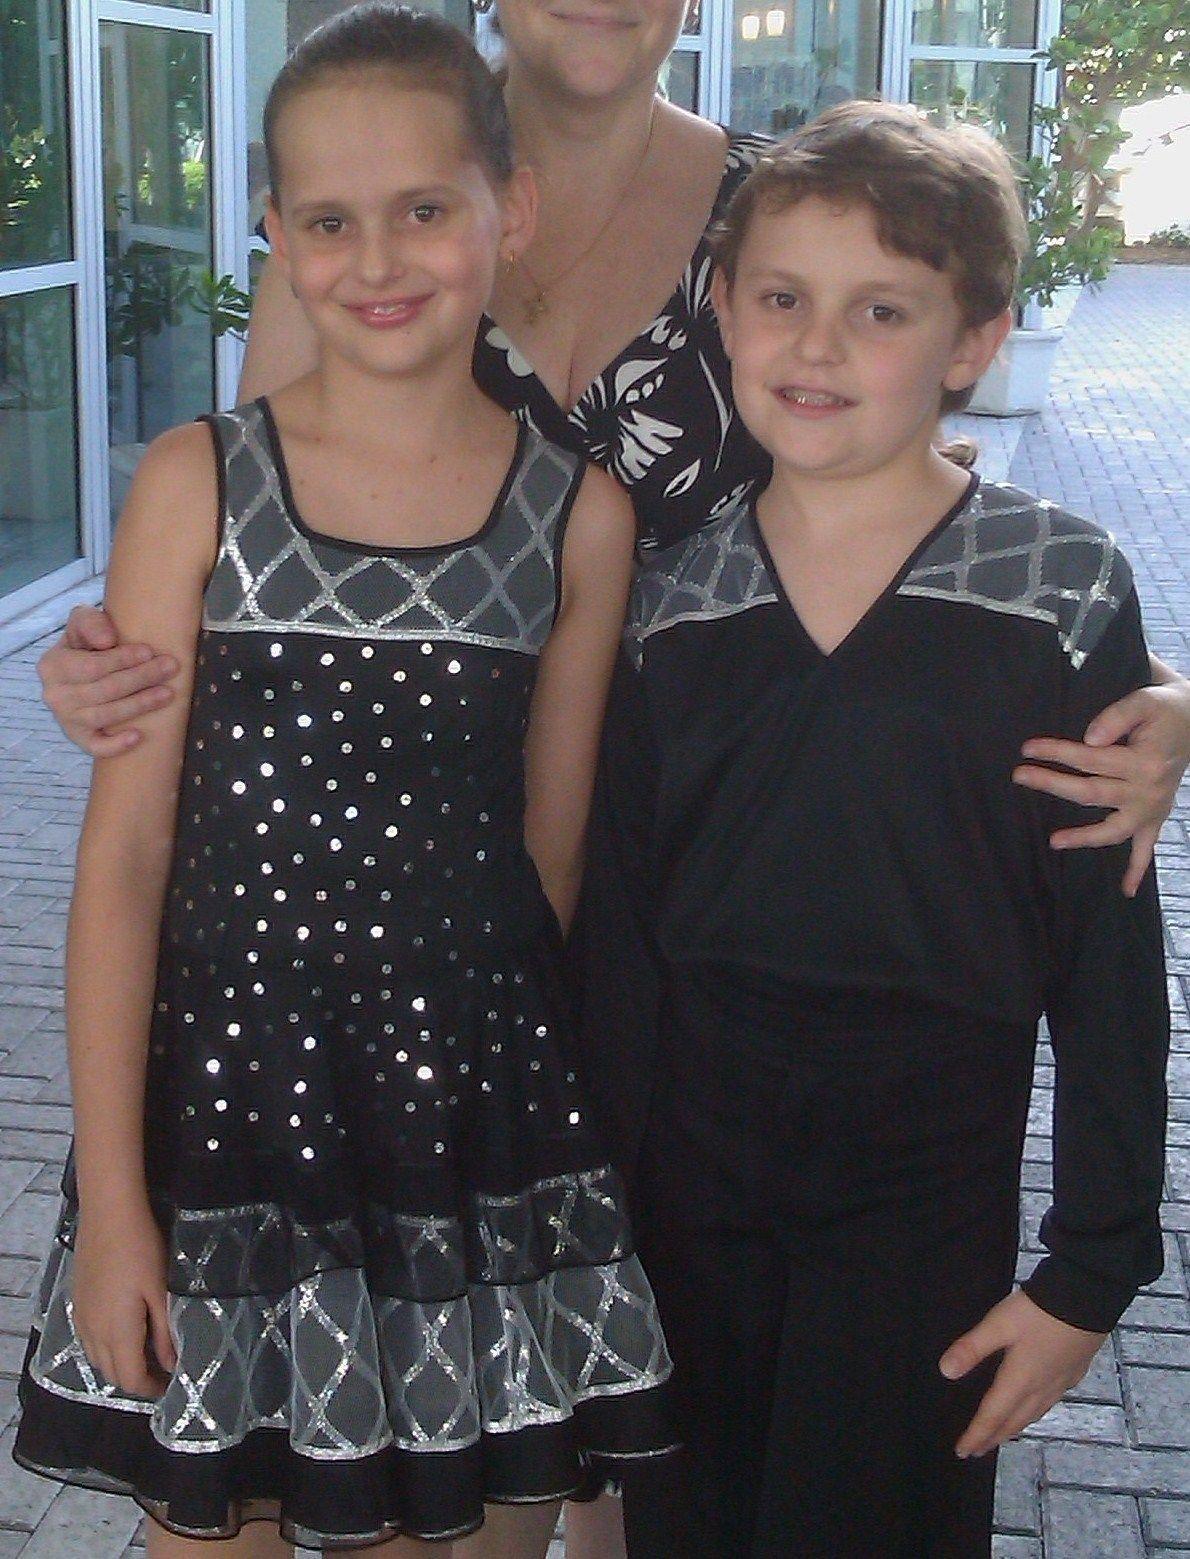 a79b9ab32 Girl Custom Pre Owned Ballroom Latin Dance Dress Matching Boys Shirt 10 Yrs  | eBay